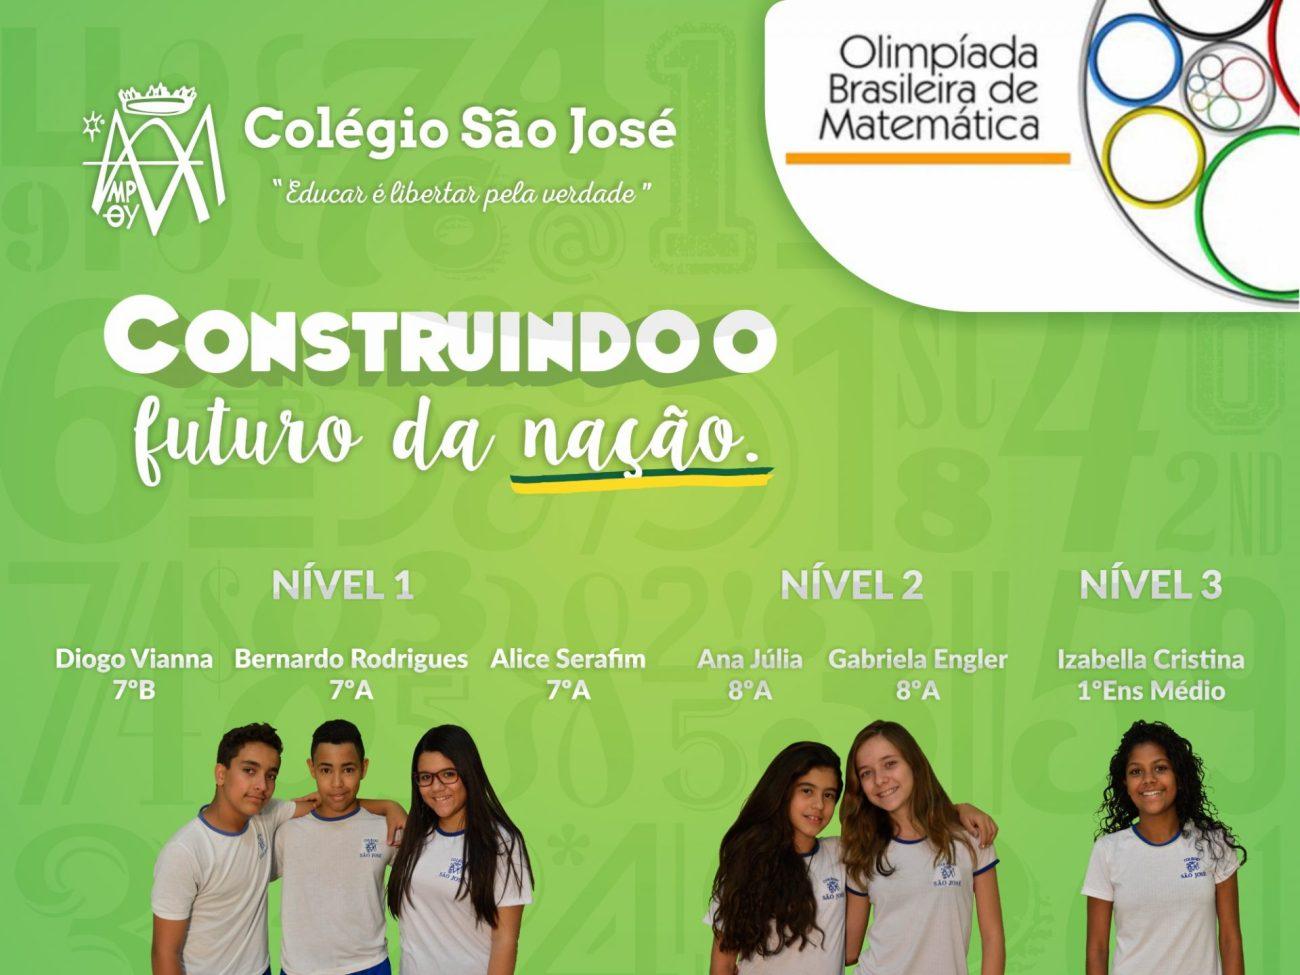 OBM 2016 Olimpíada Brasileira de Matemática